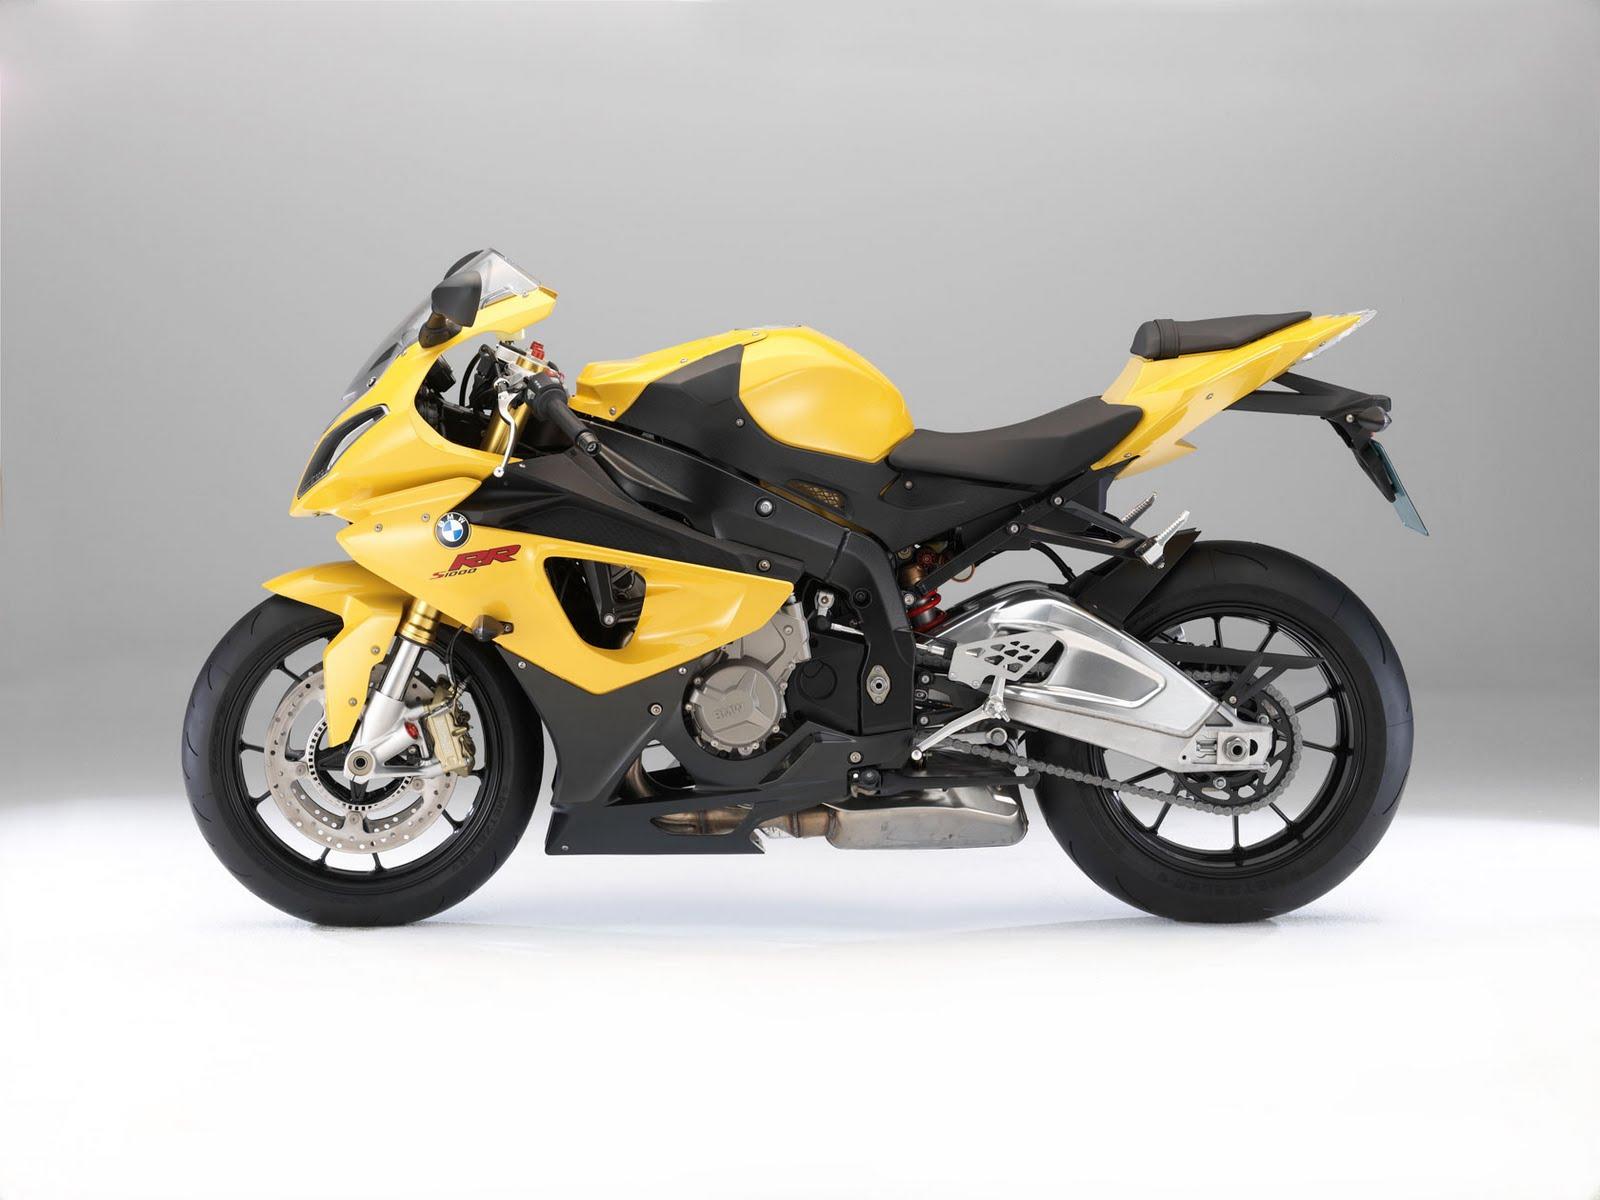 http://2.bp.blogspot.com/-jmqJ3FUYH04/TeJ3xDnPanI/AAAAAAAAARg/PEpdViaWnlI/s1600/2011-BMW-S1000RR-Motorcycle.jpg